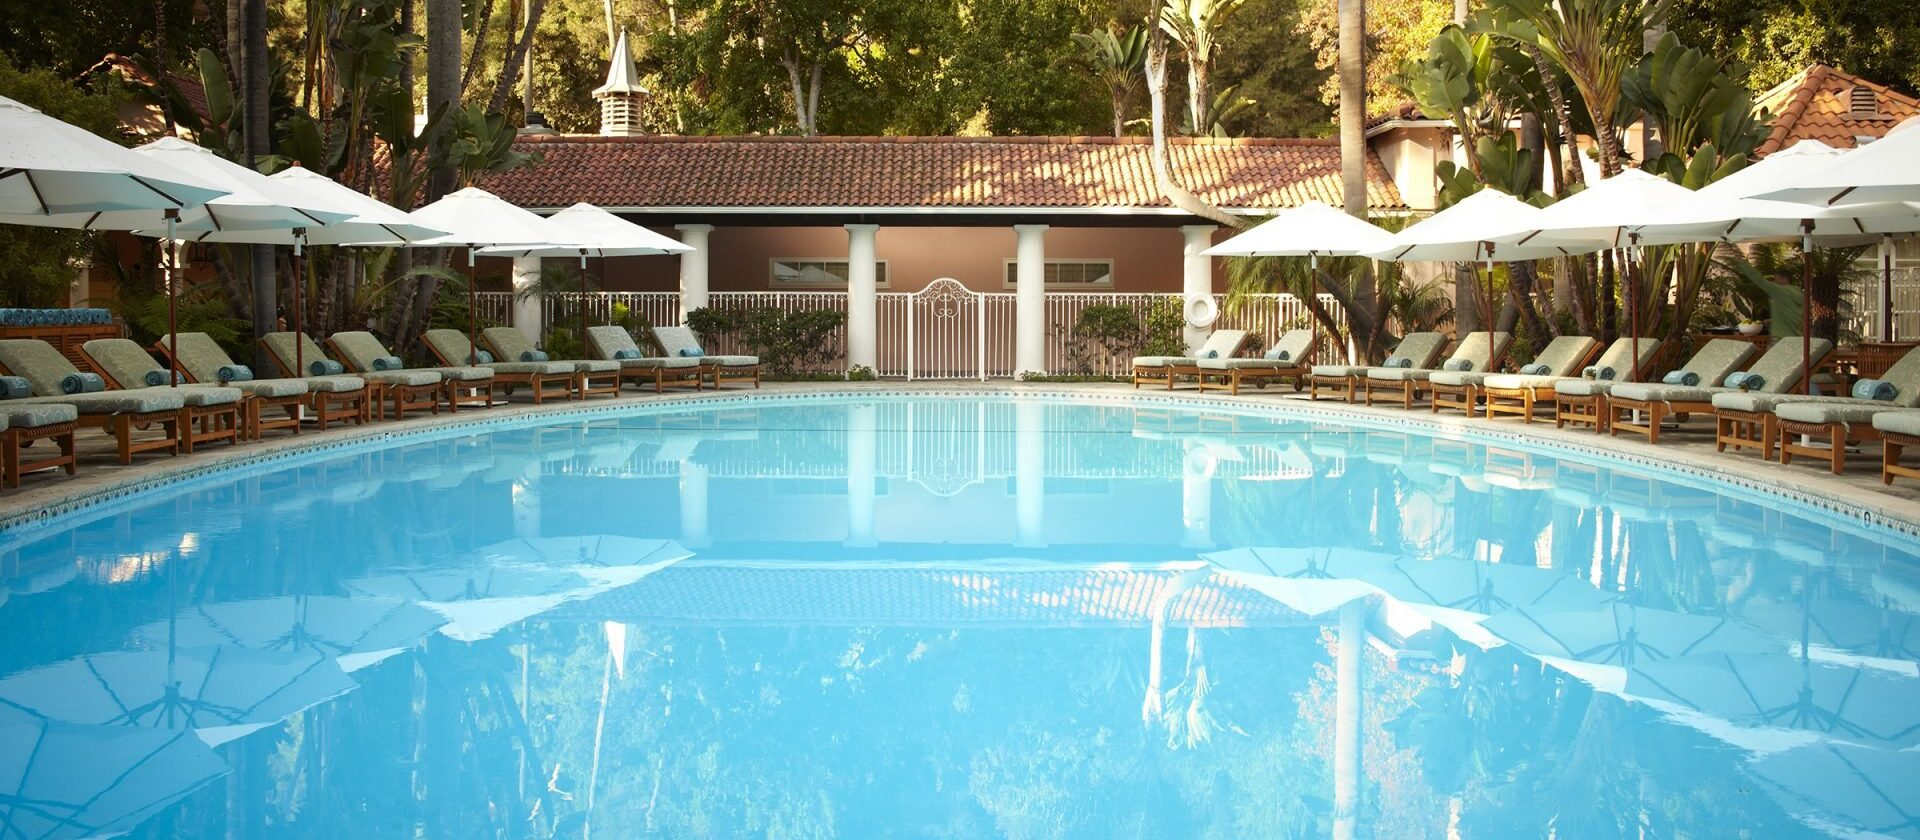 hotel bel air 5 star luxury hotel dorchester collection